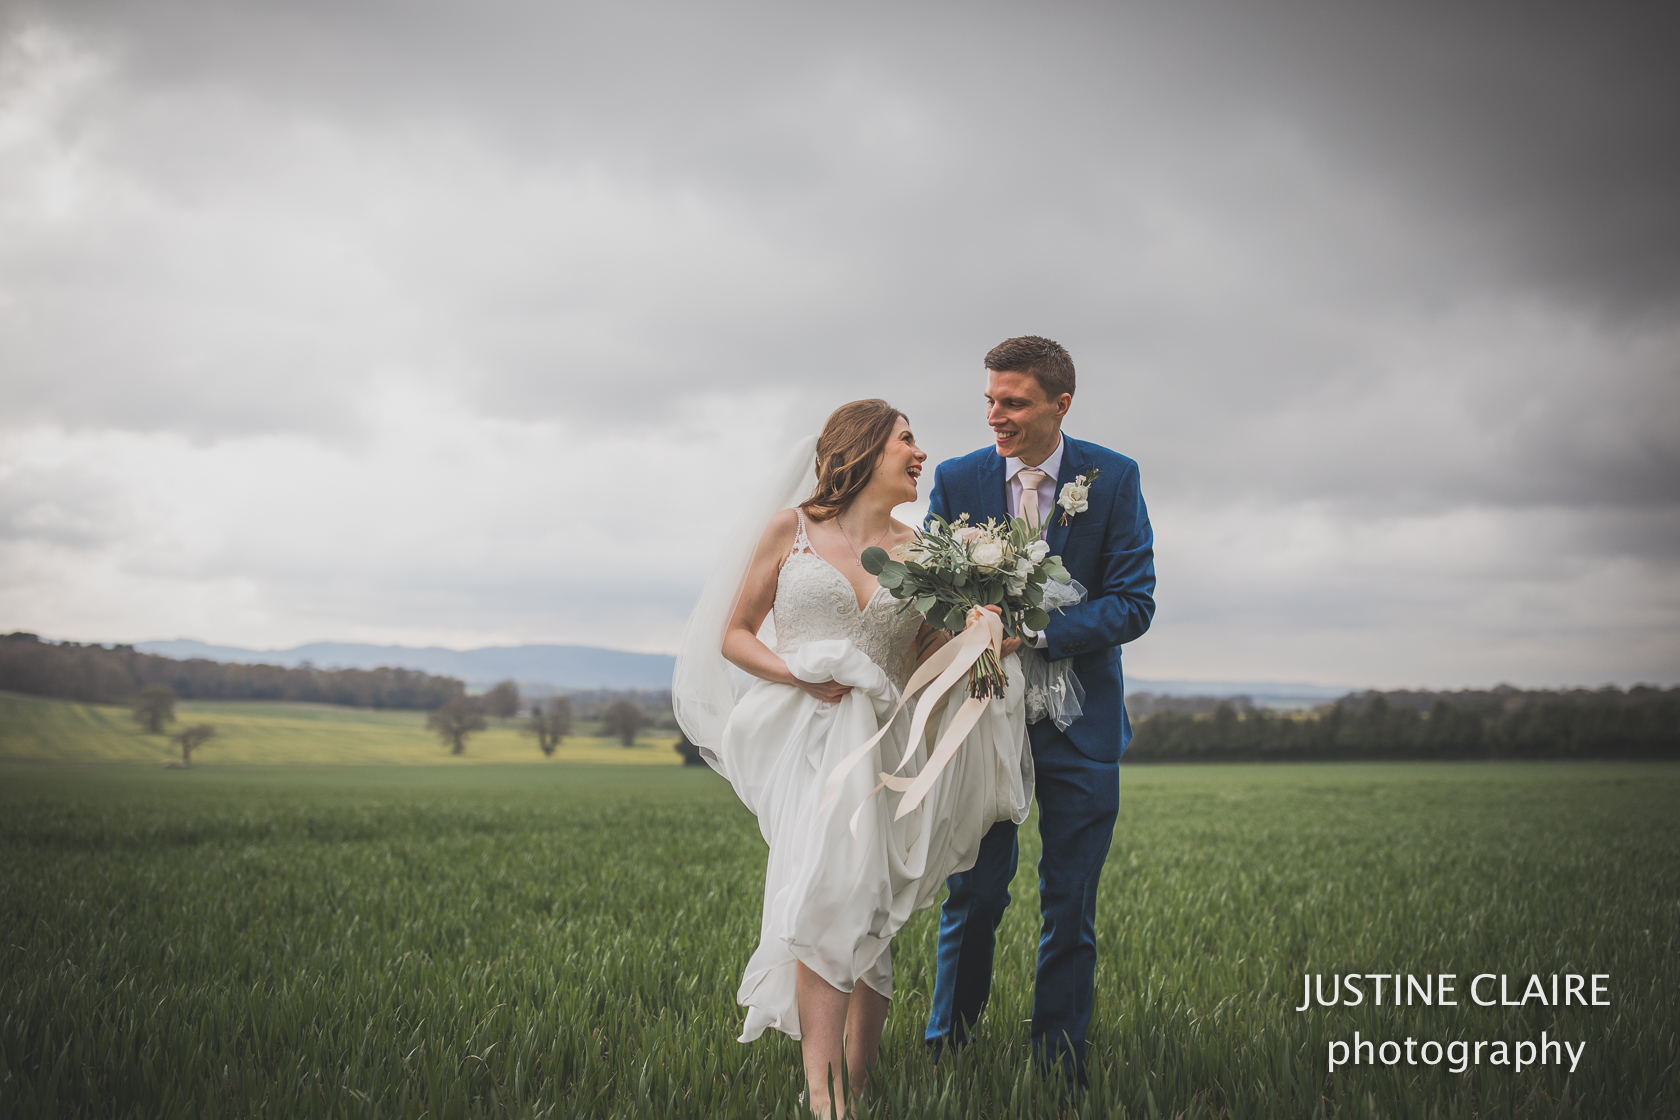 Fitzleroi Fittleworth petworth Billingshurst farm Wedding Photography by Justine Claire photographer Arundel Worthing Brighton-50.jpg